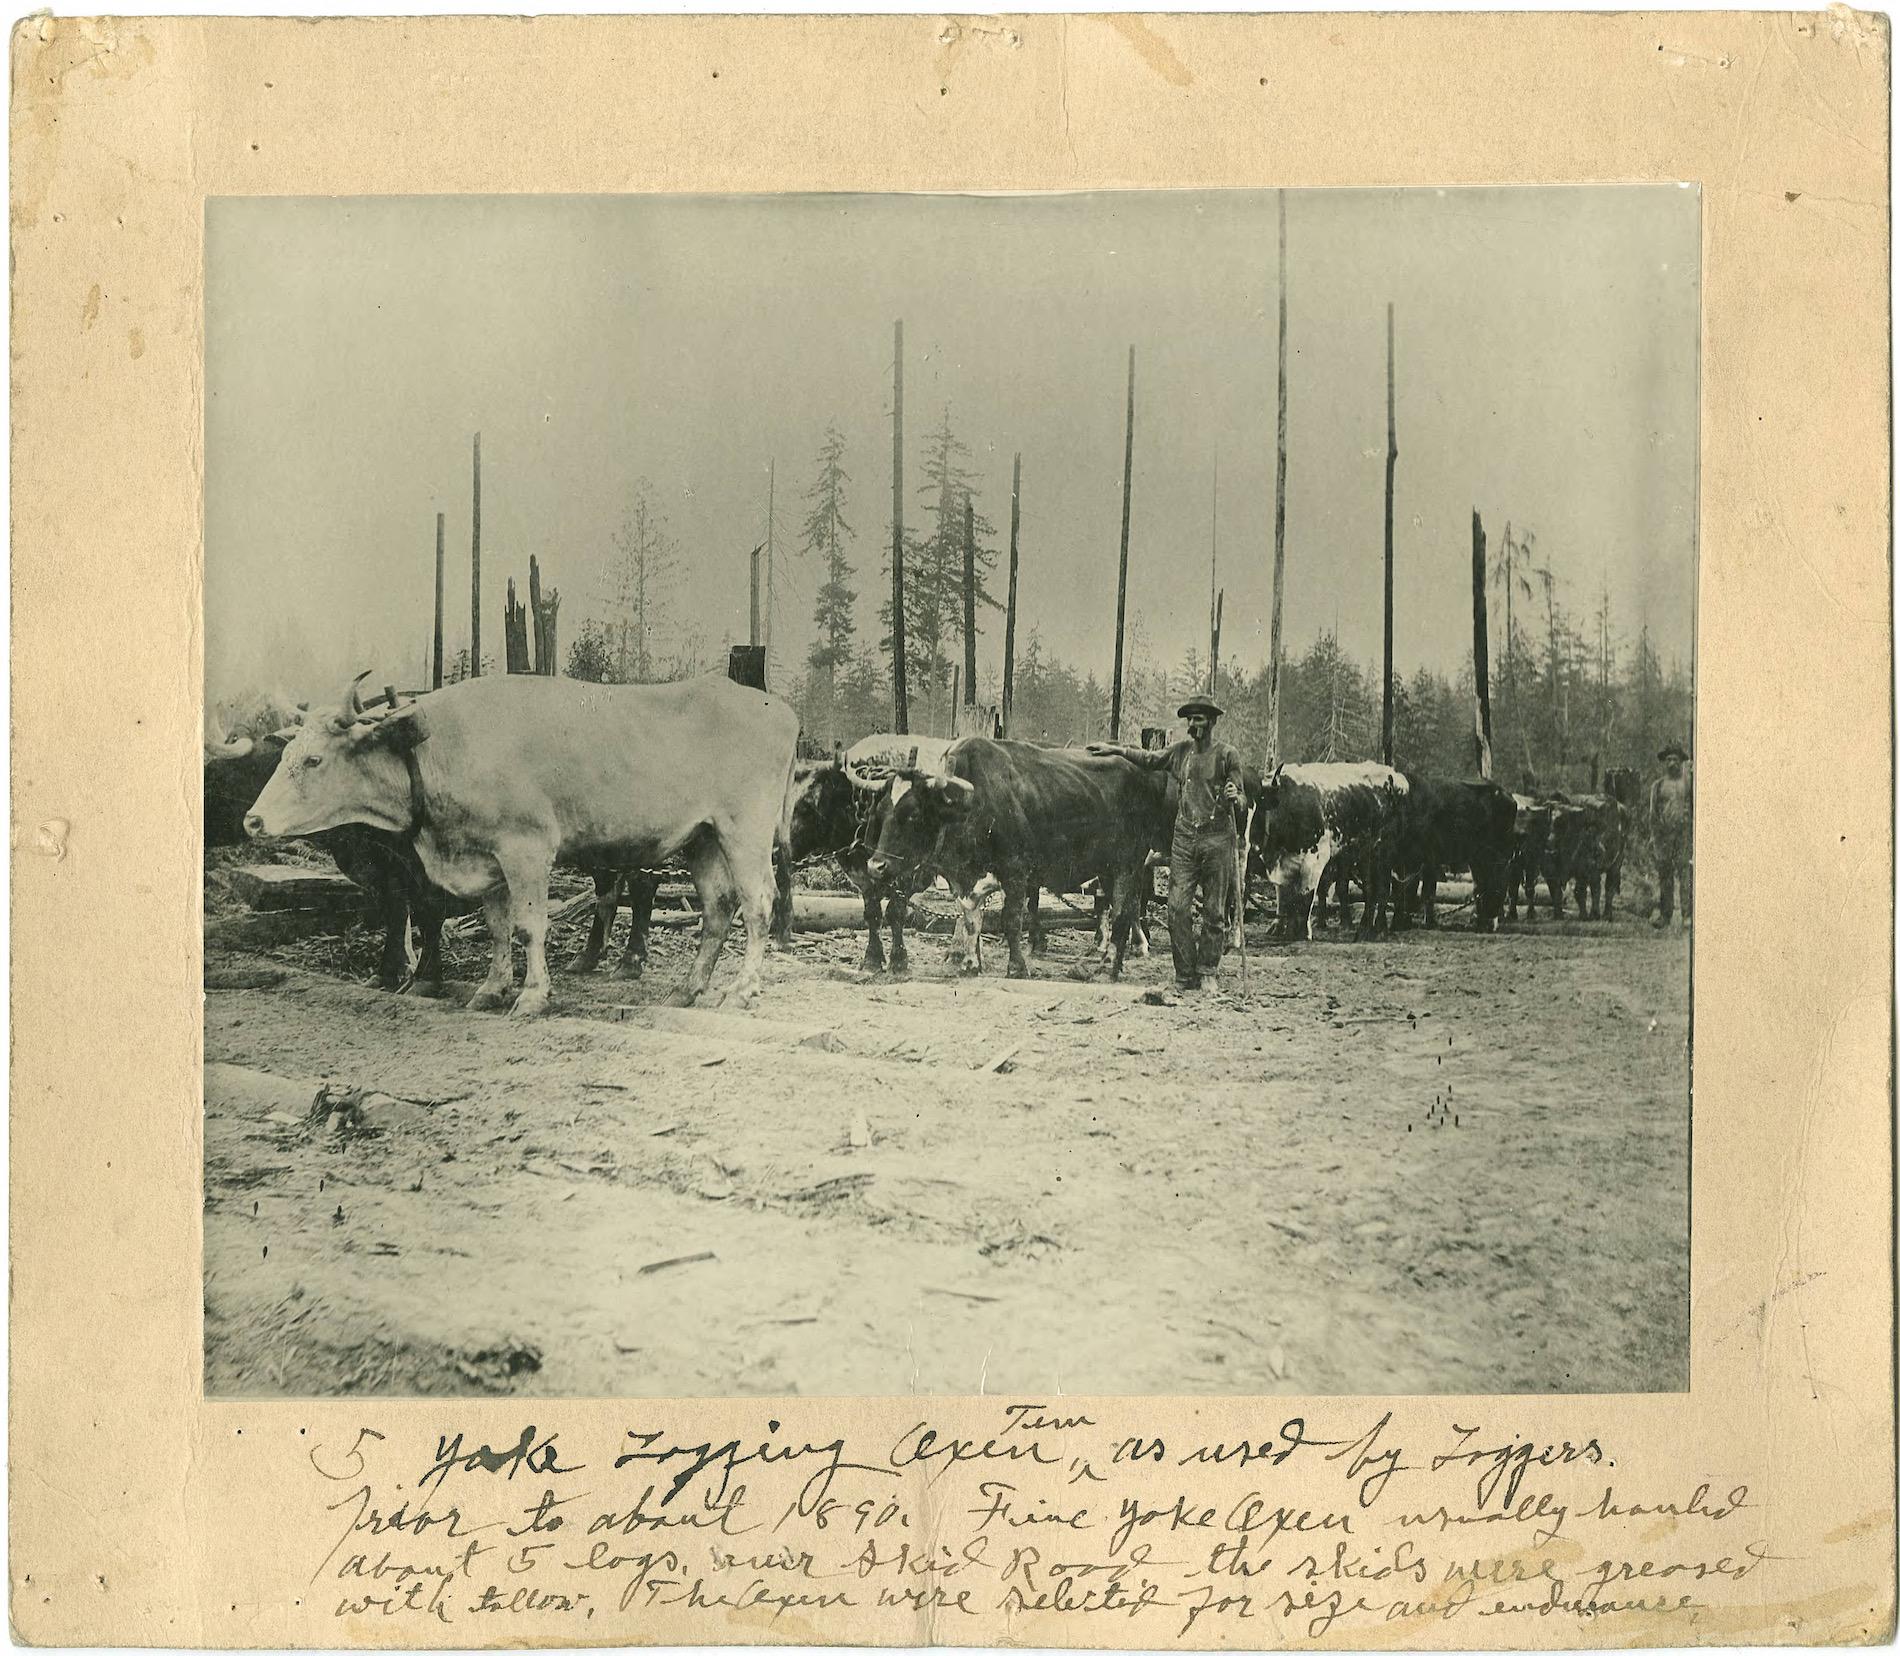 1890-Five-yoke logging oxen team (front side).